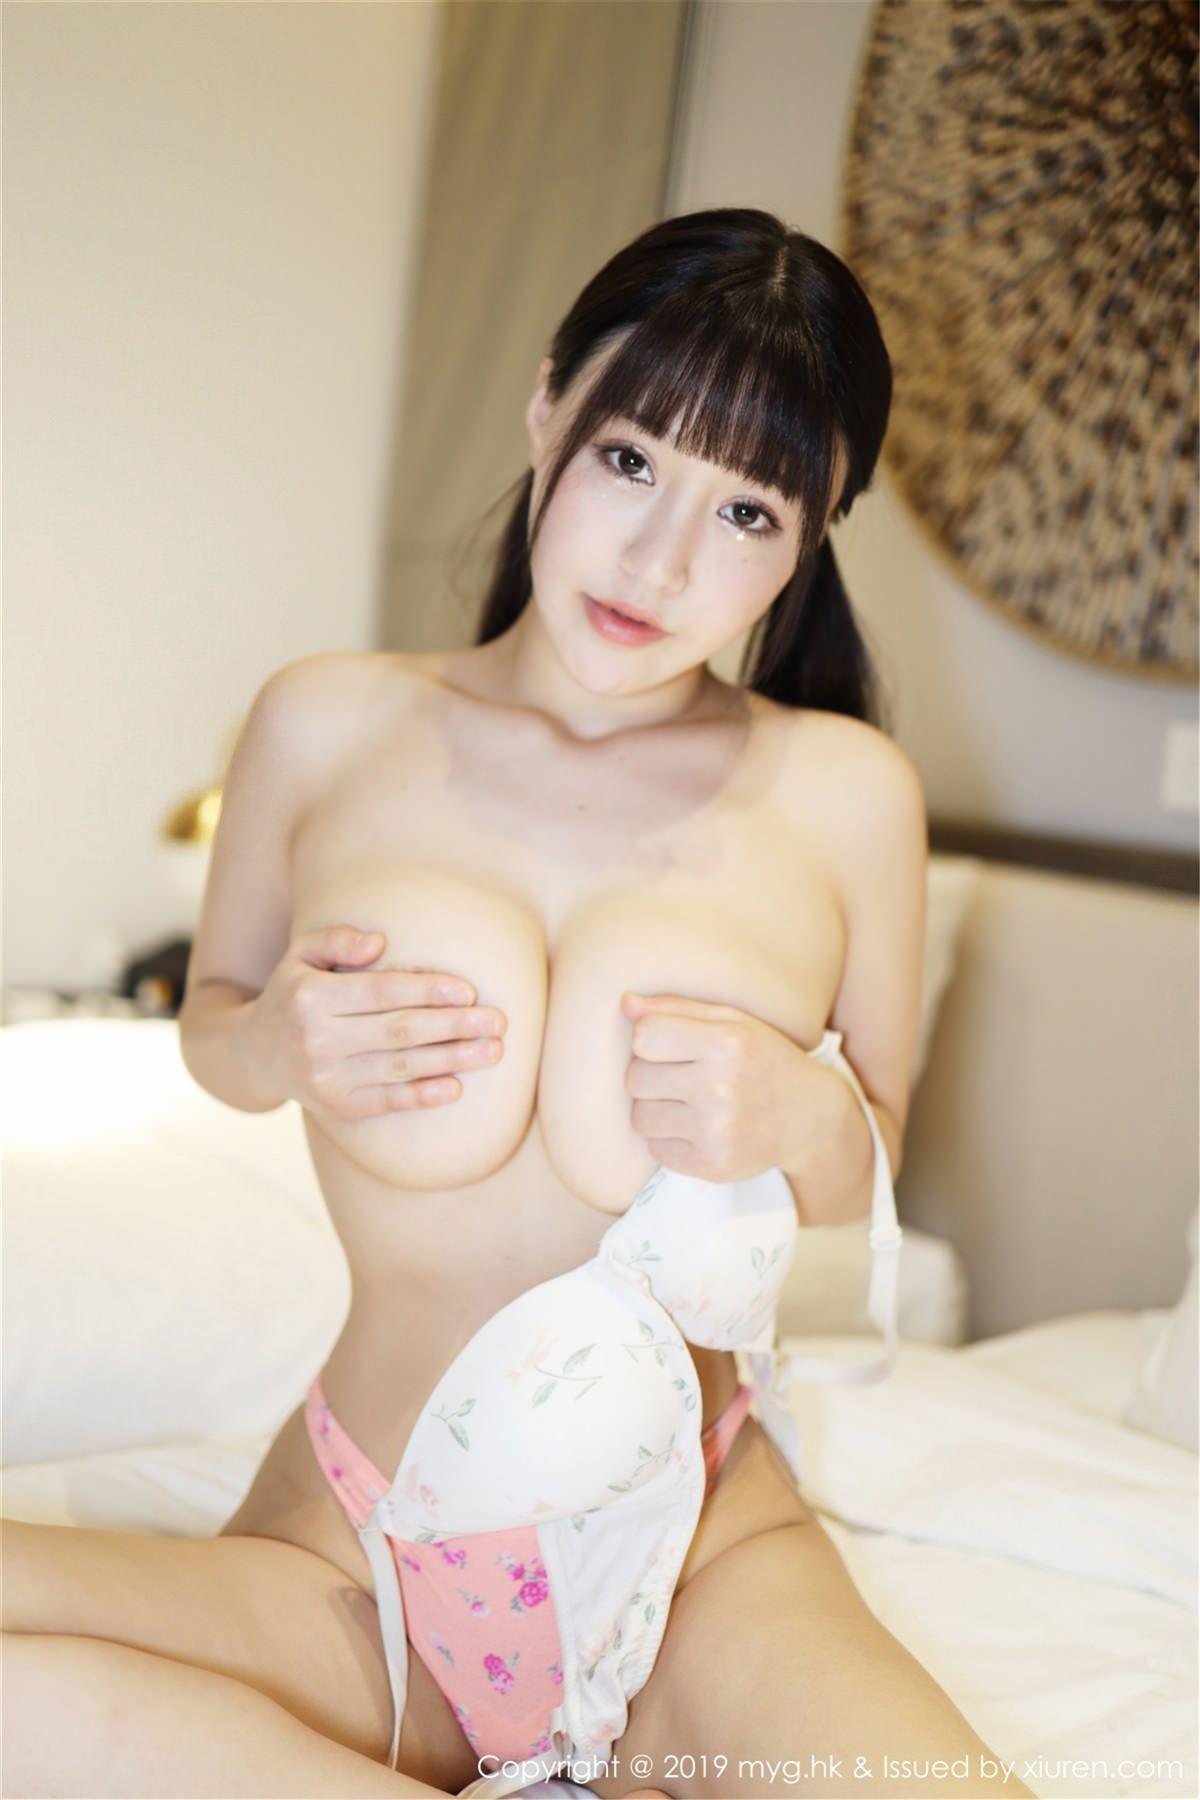 MyGirl Vol.363 34P, mygirl, Zhu Ke Er